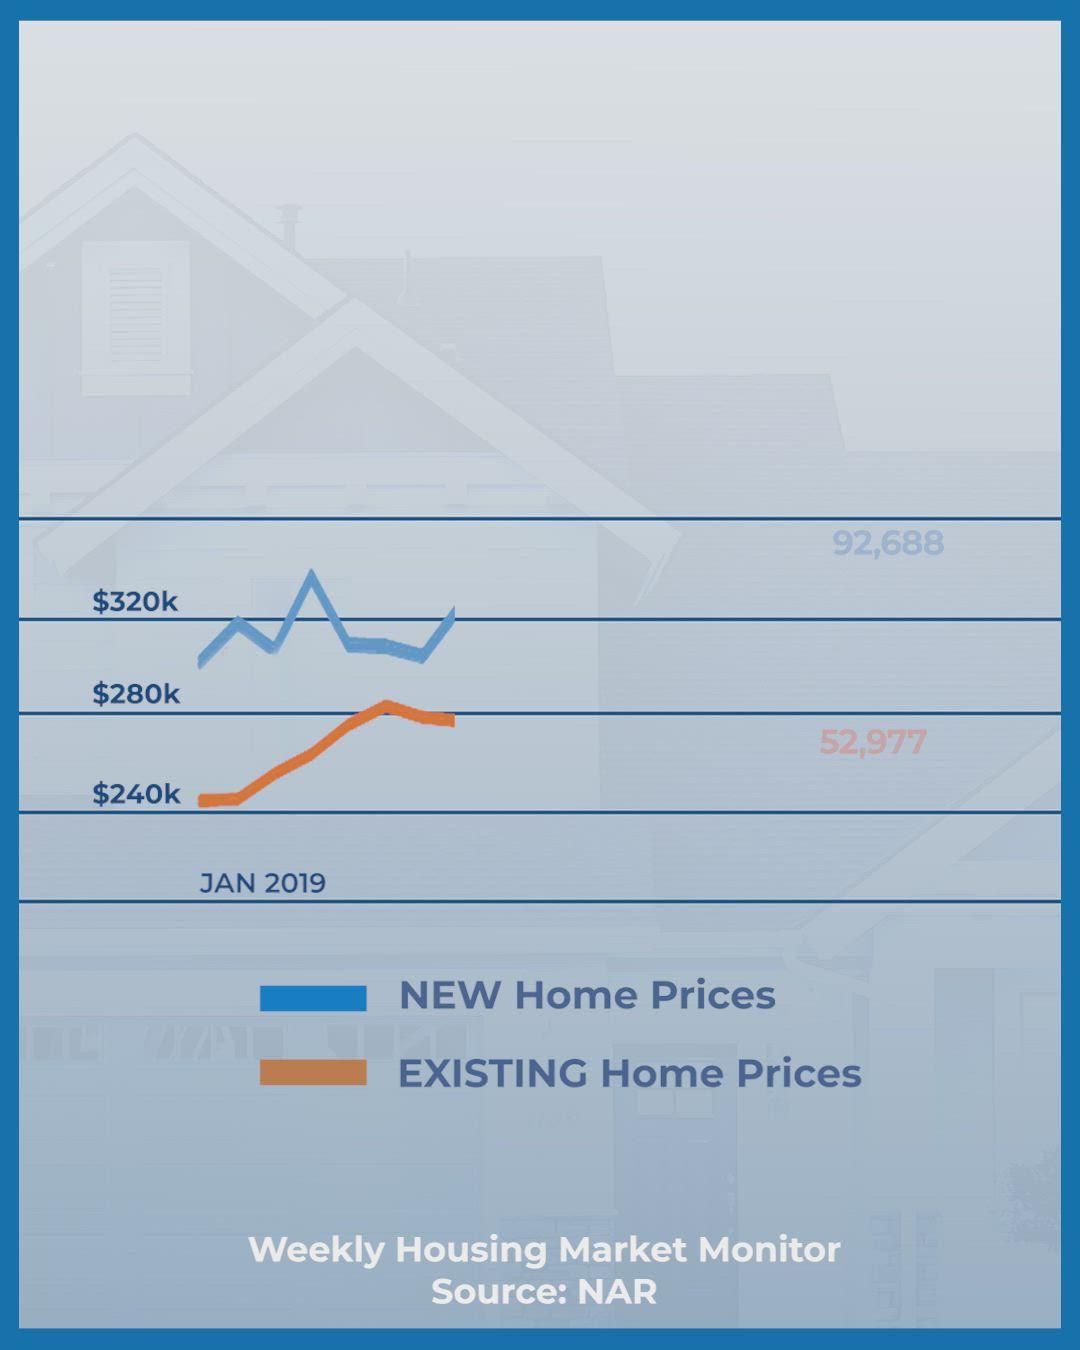 Weekly Housing Market Monitor 10 29 Video Housing Market Marketing Marketing Data